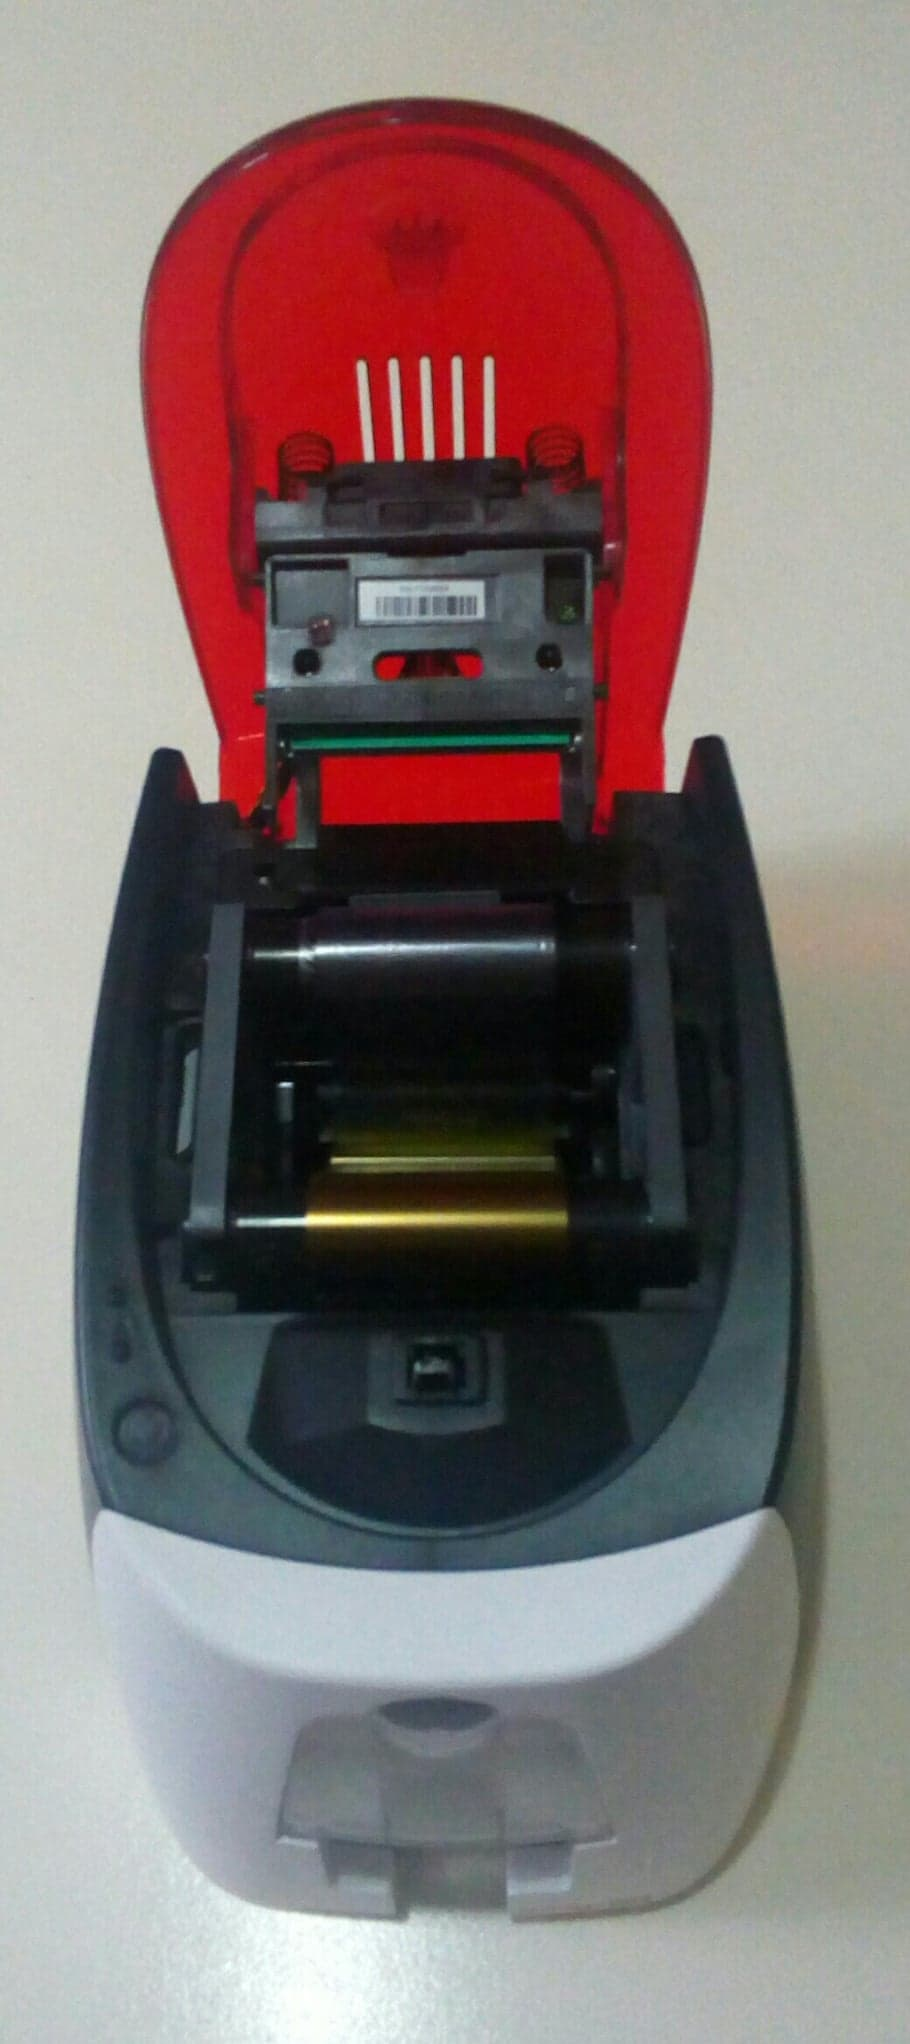 Vendo Impressora de Cartões e Crachás PVC - Semi Nova